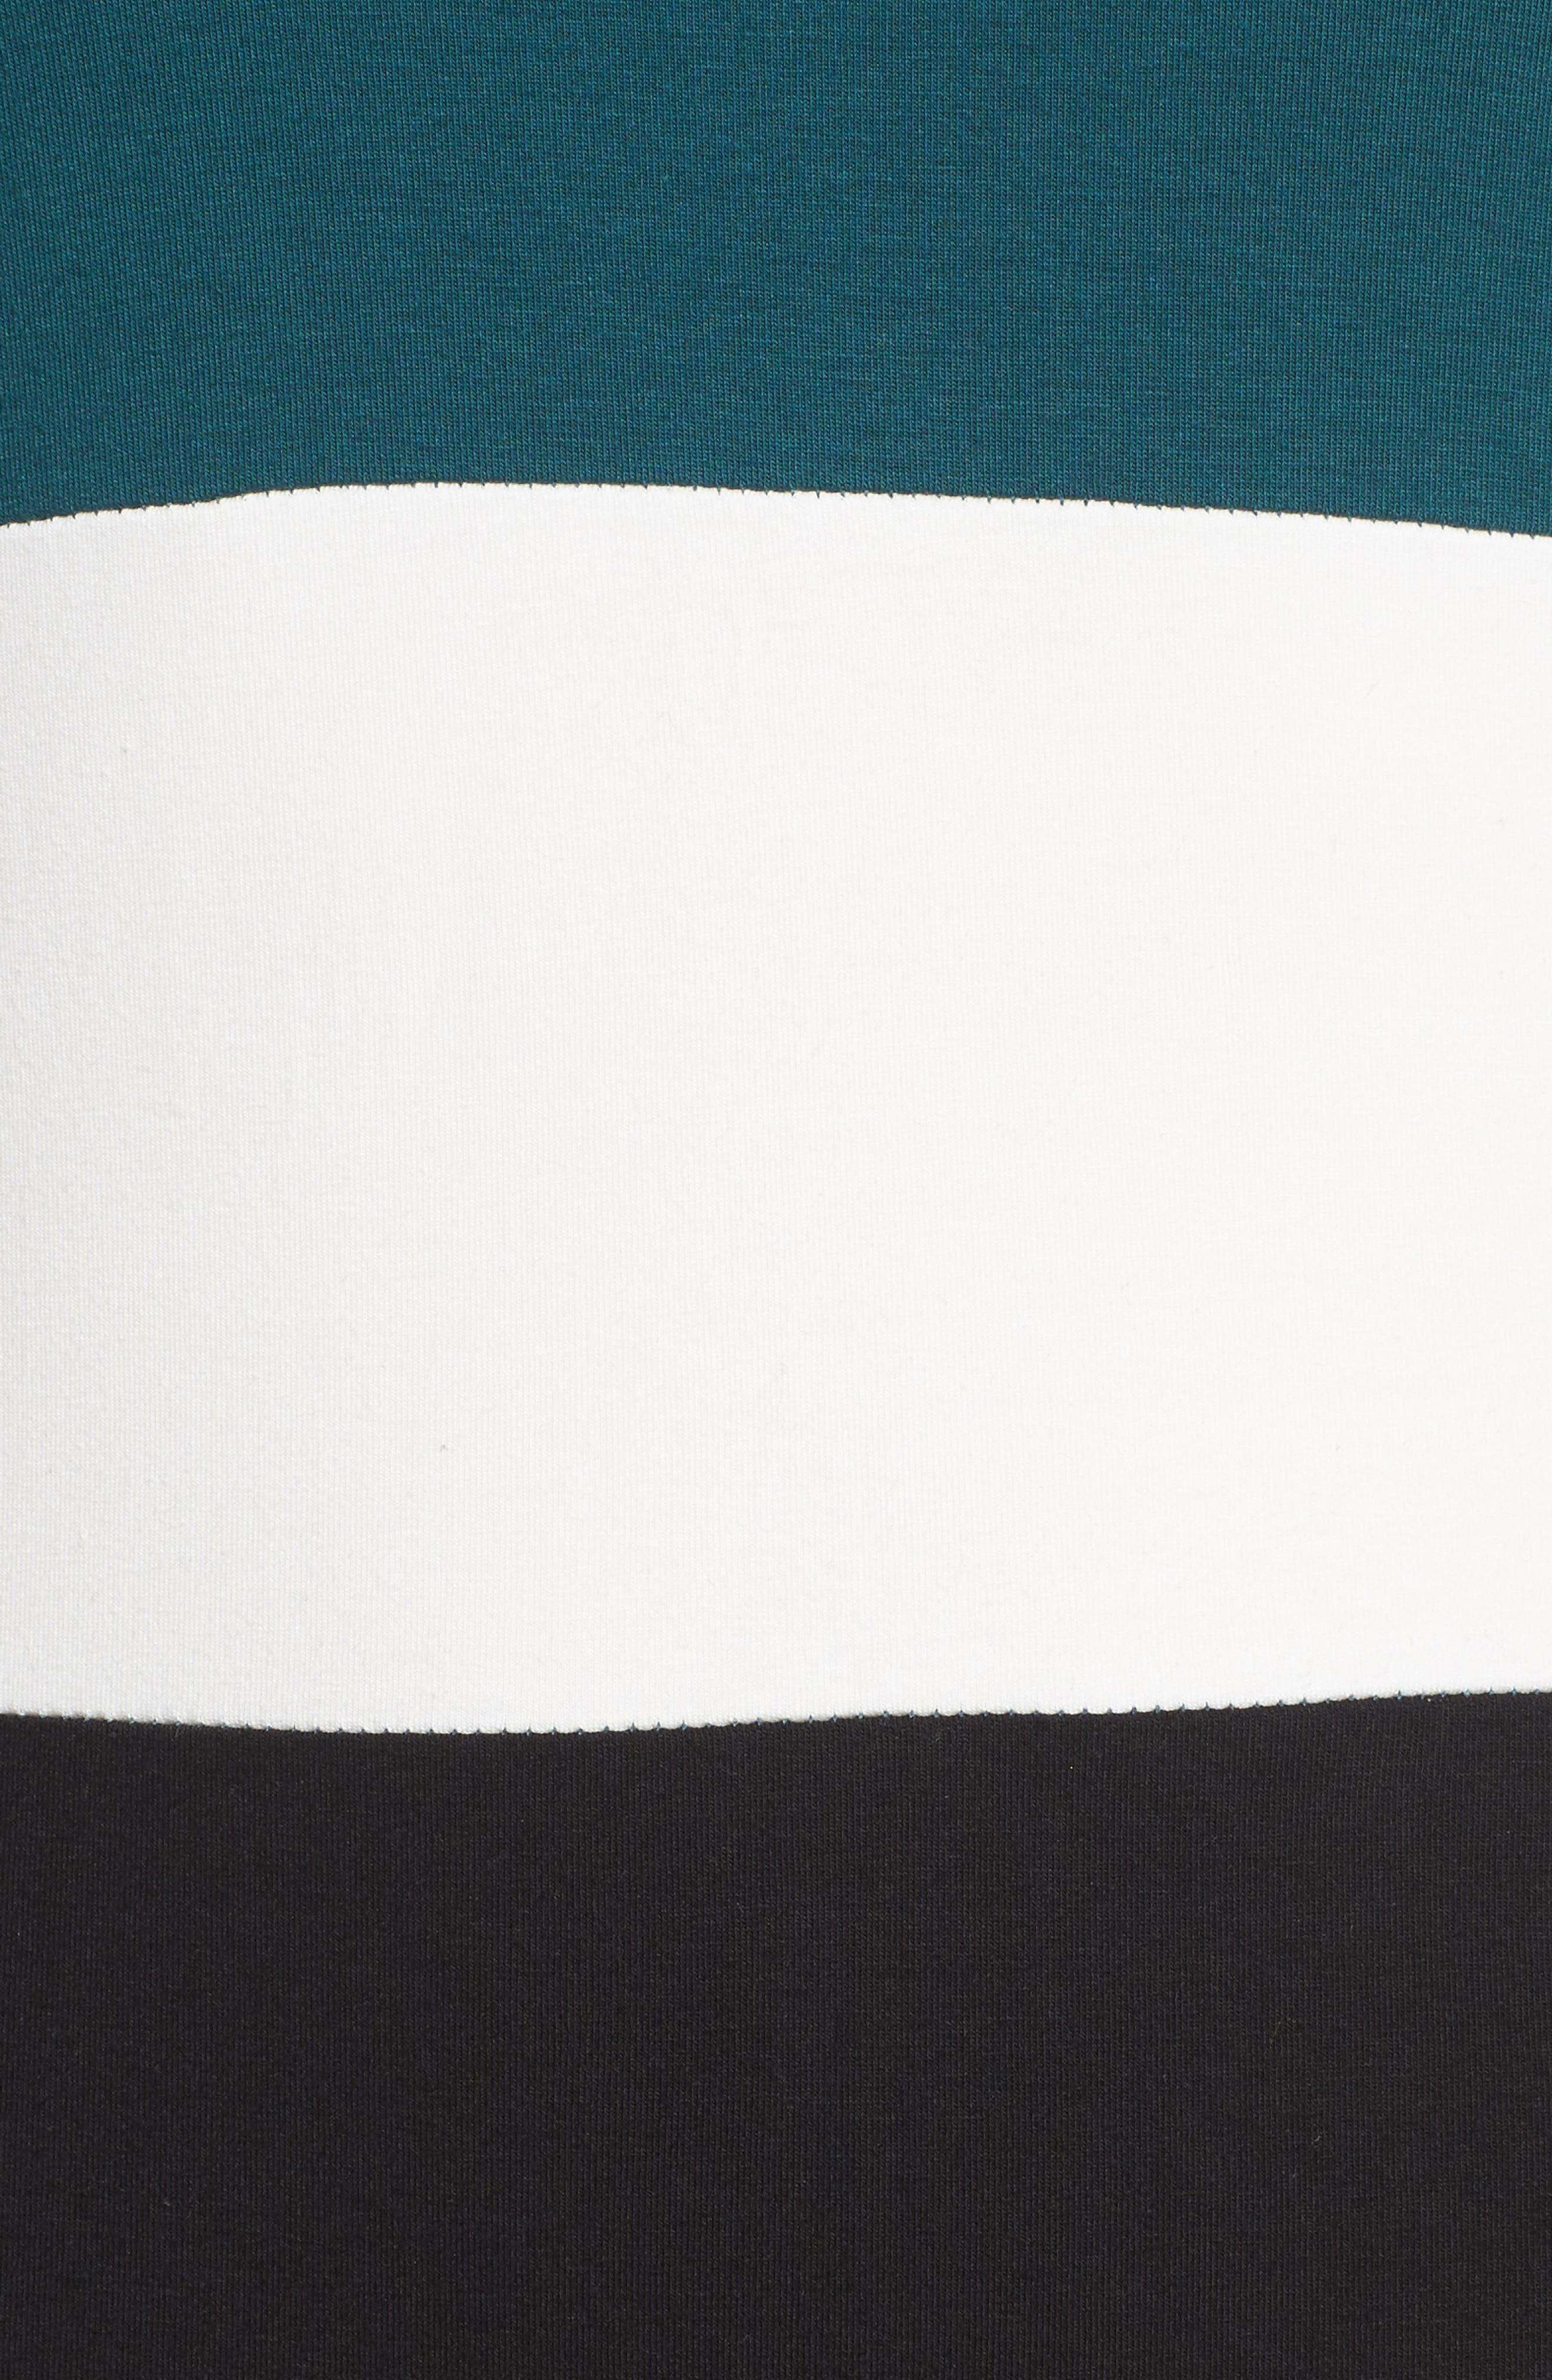 Bianca Bodysuit,                             Alternate thumbnail 6, color,                             Deep Teal/ Gardenia/ Black